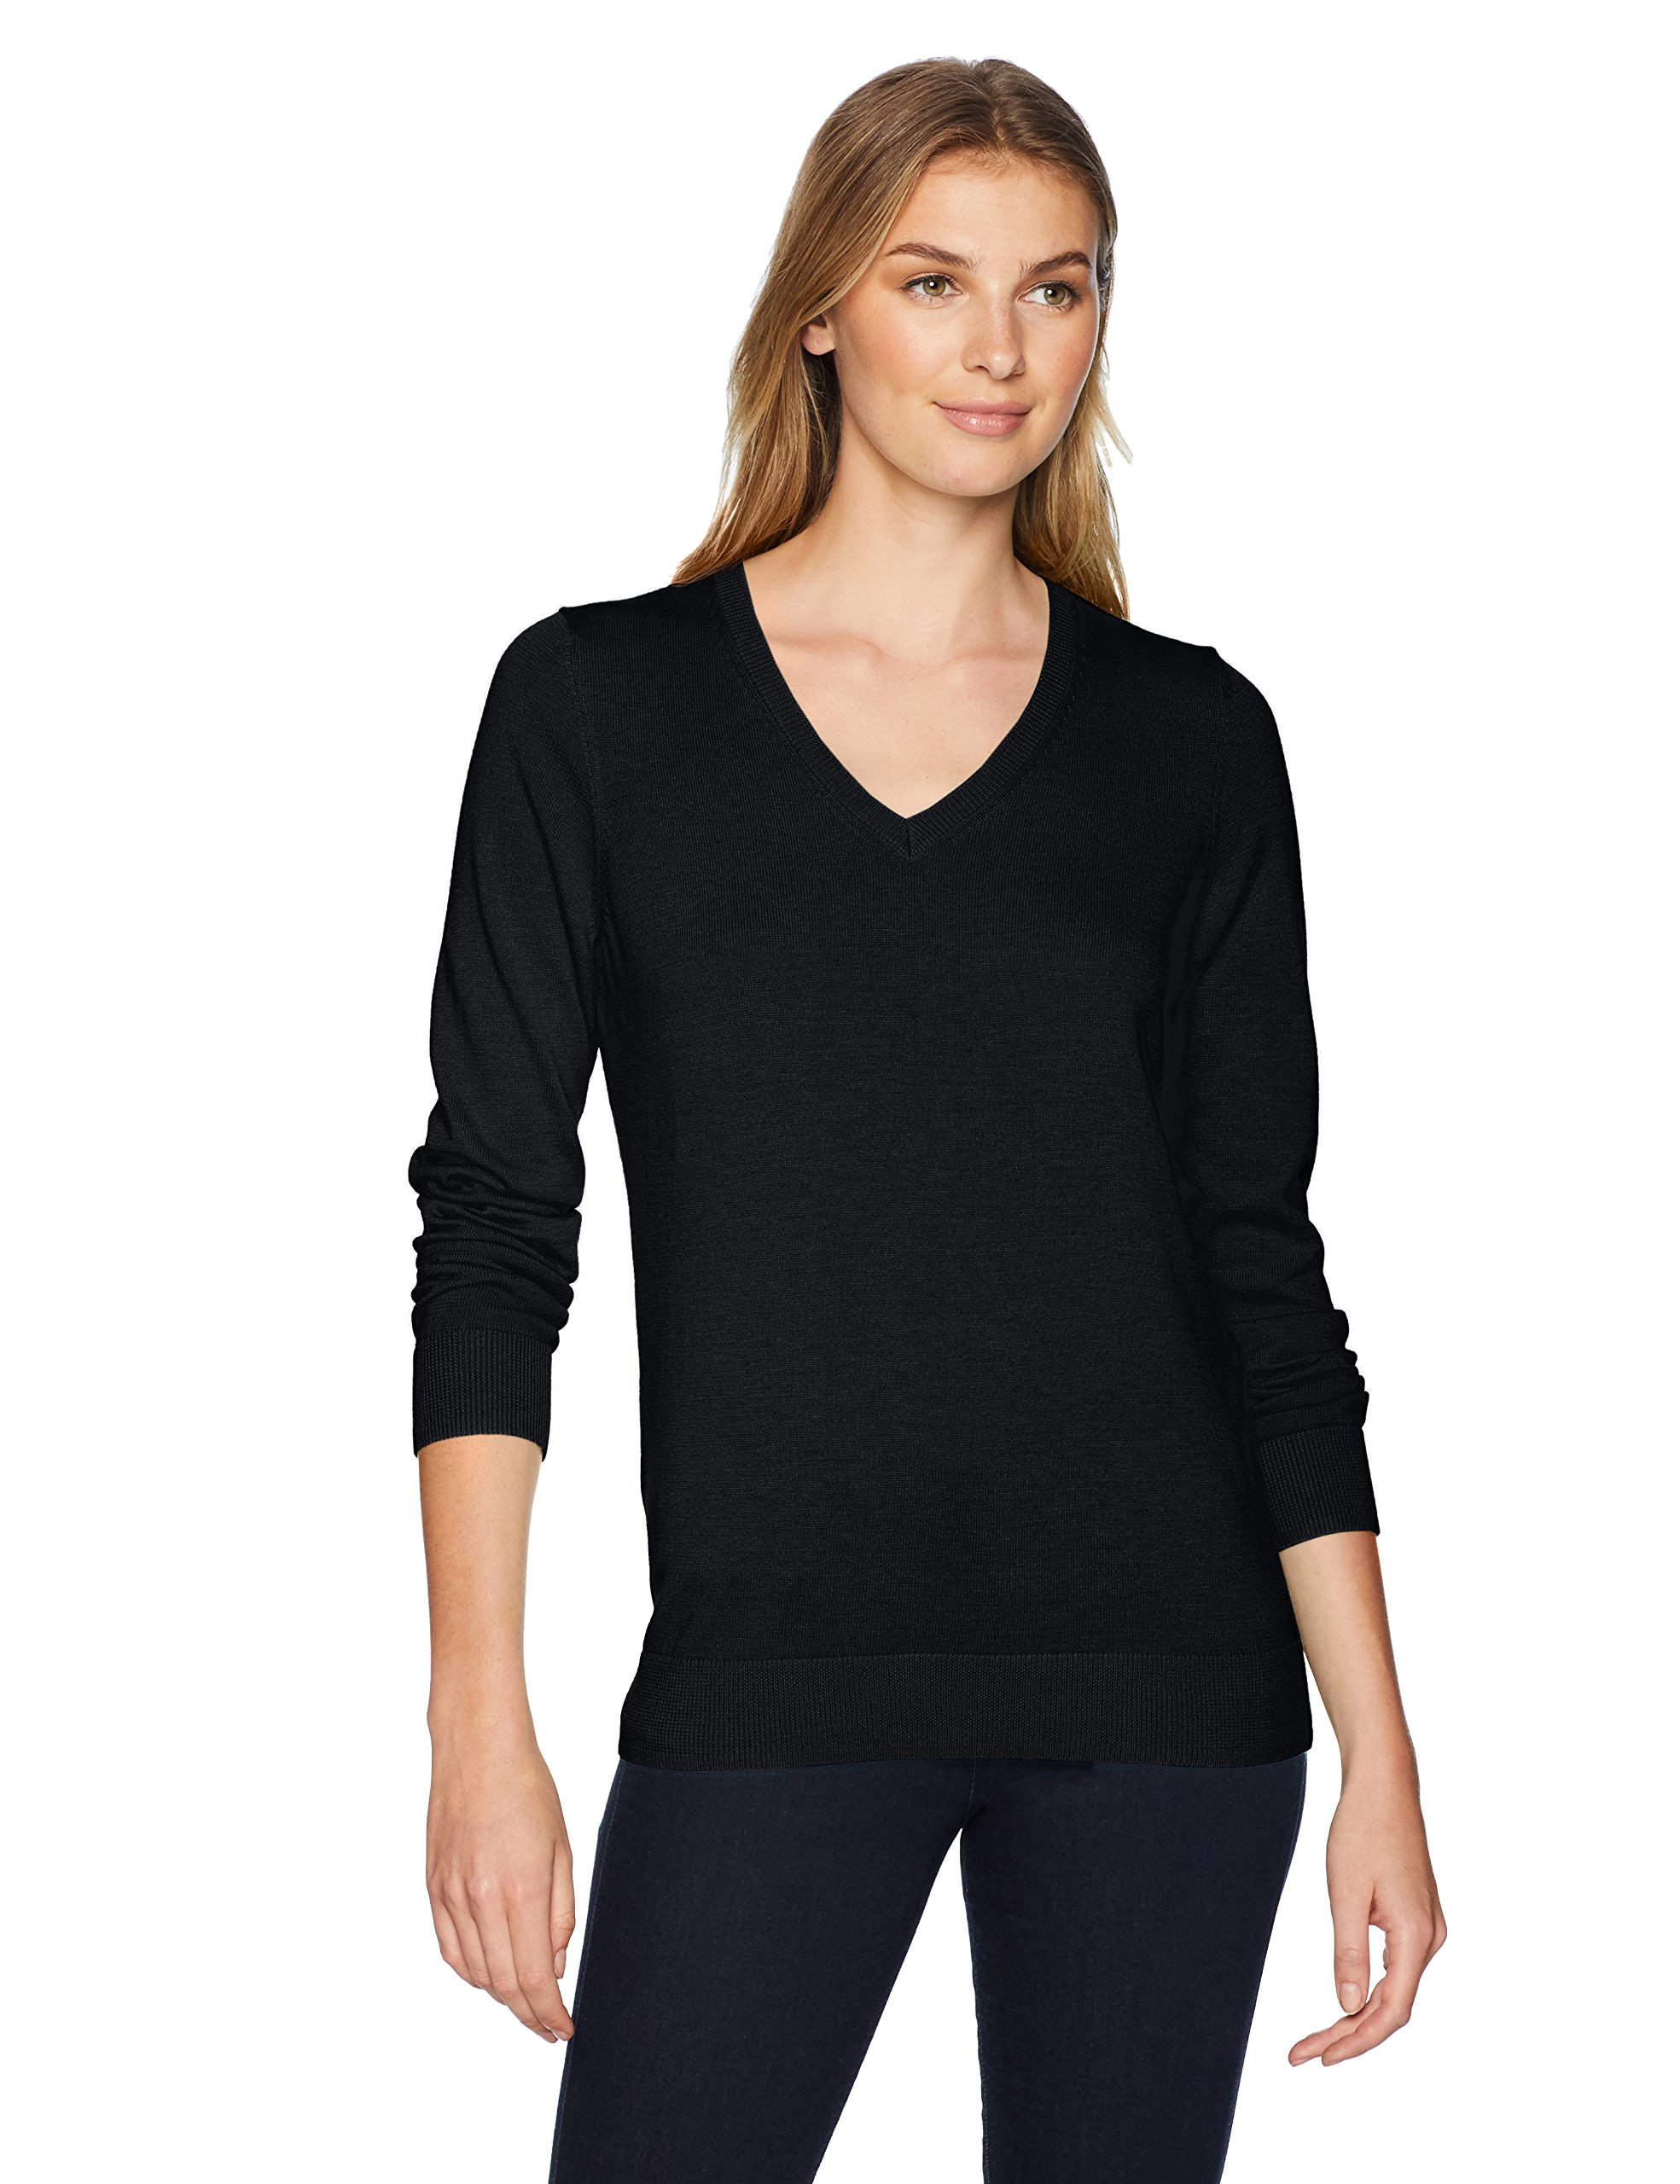 Amazon Essentials Women's Standard V-Neck Sweater, Black, X-Large